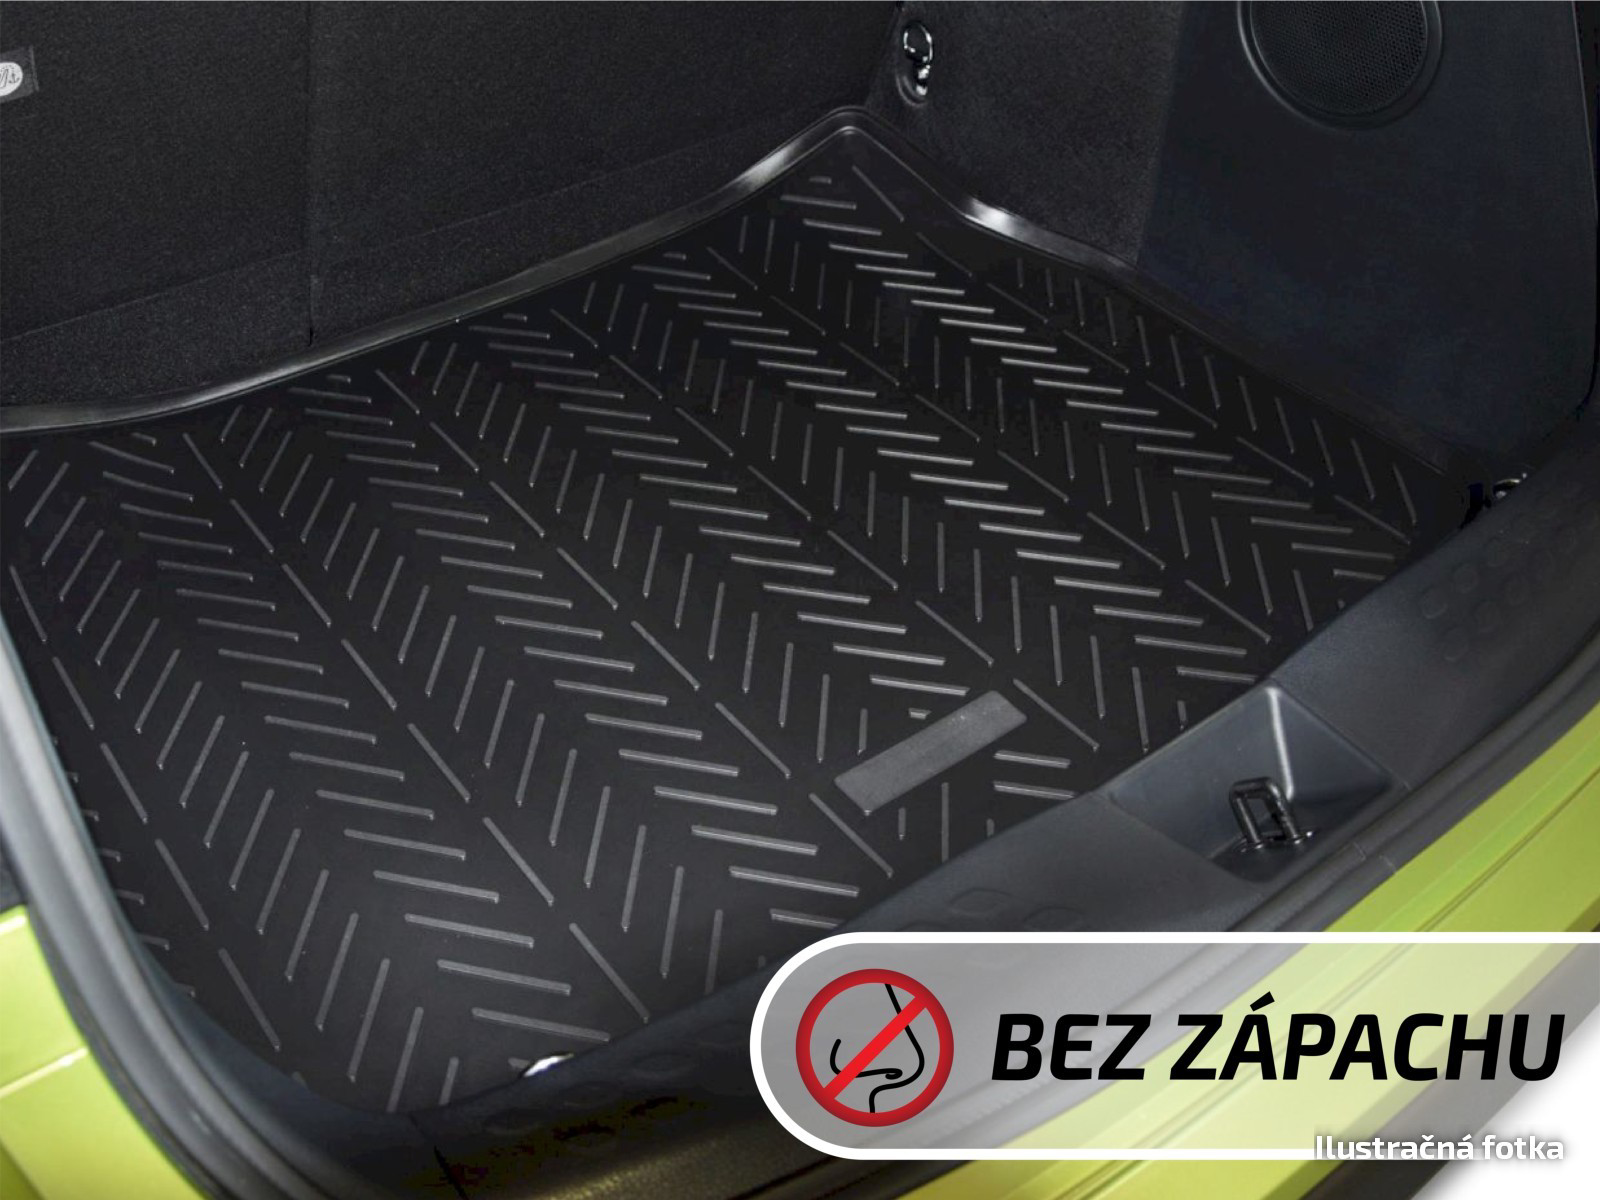 Poza cu Tavita de portbagaj Premium, Renault Captur, 2013-2019